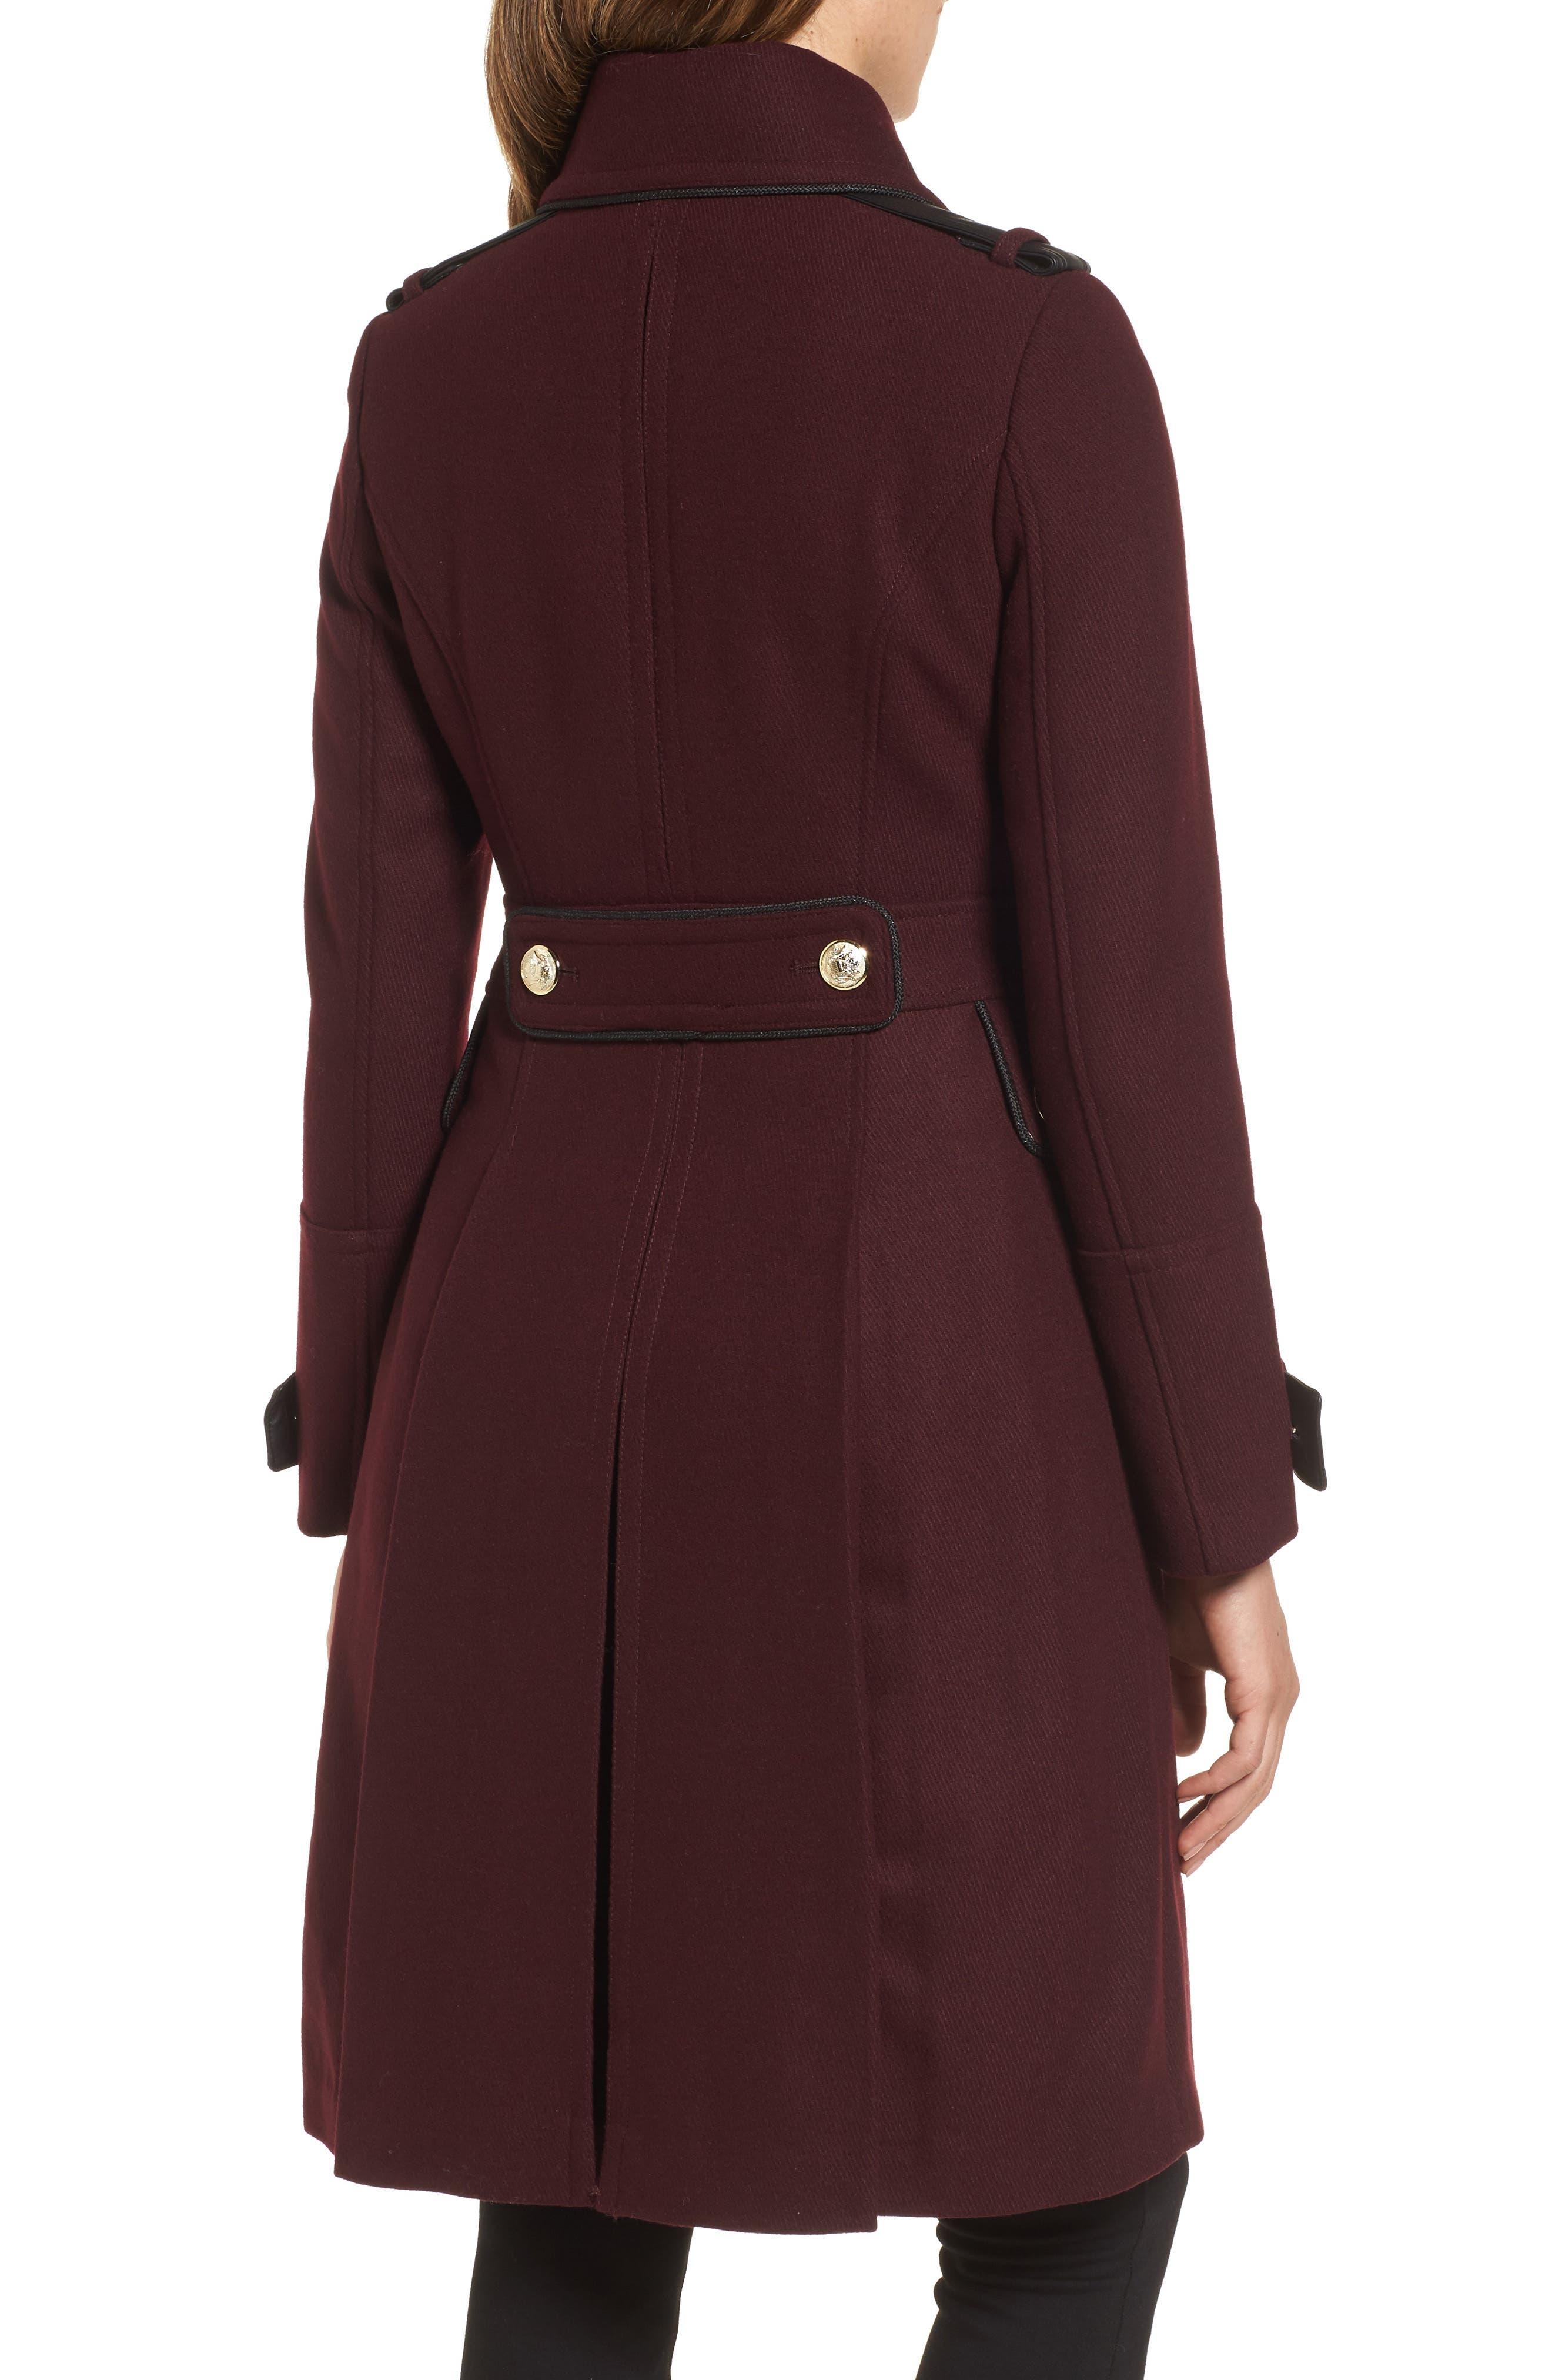 Wool Blend Military Coat,                             Alternate thumbnail 4, color,